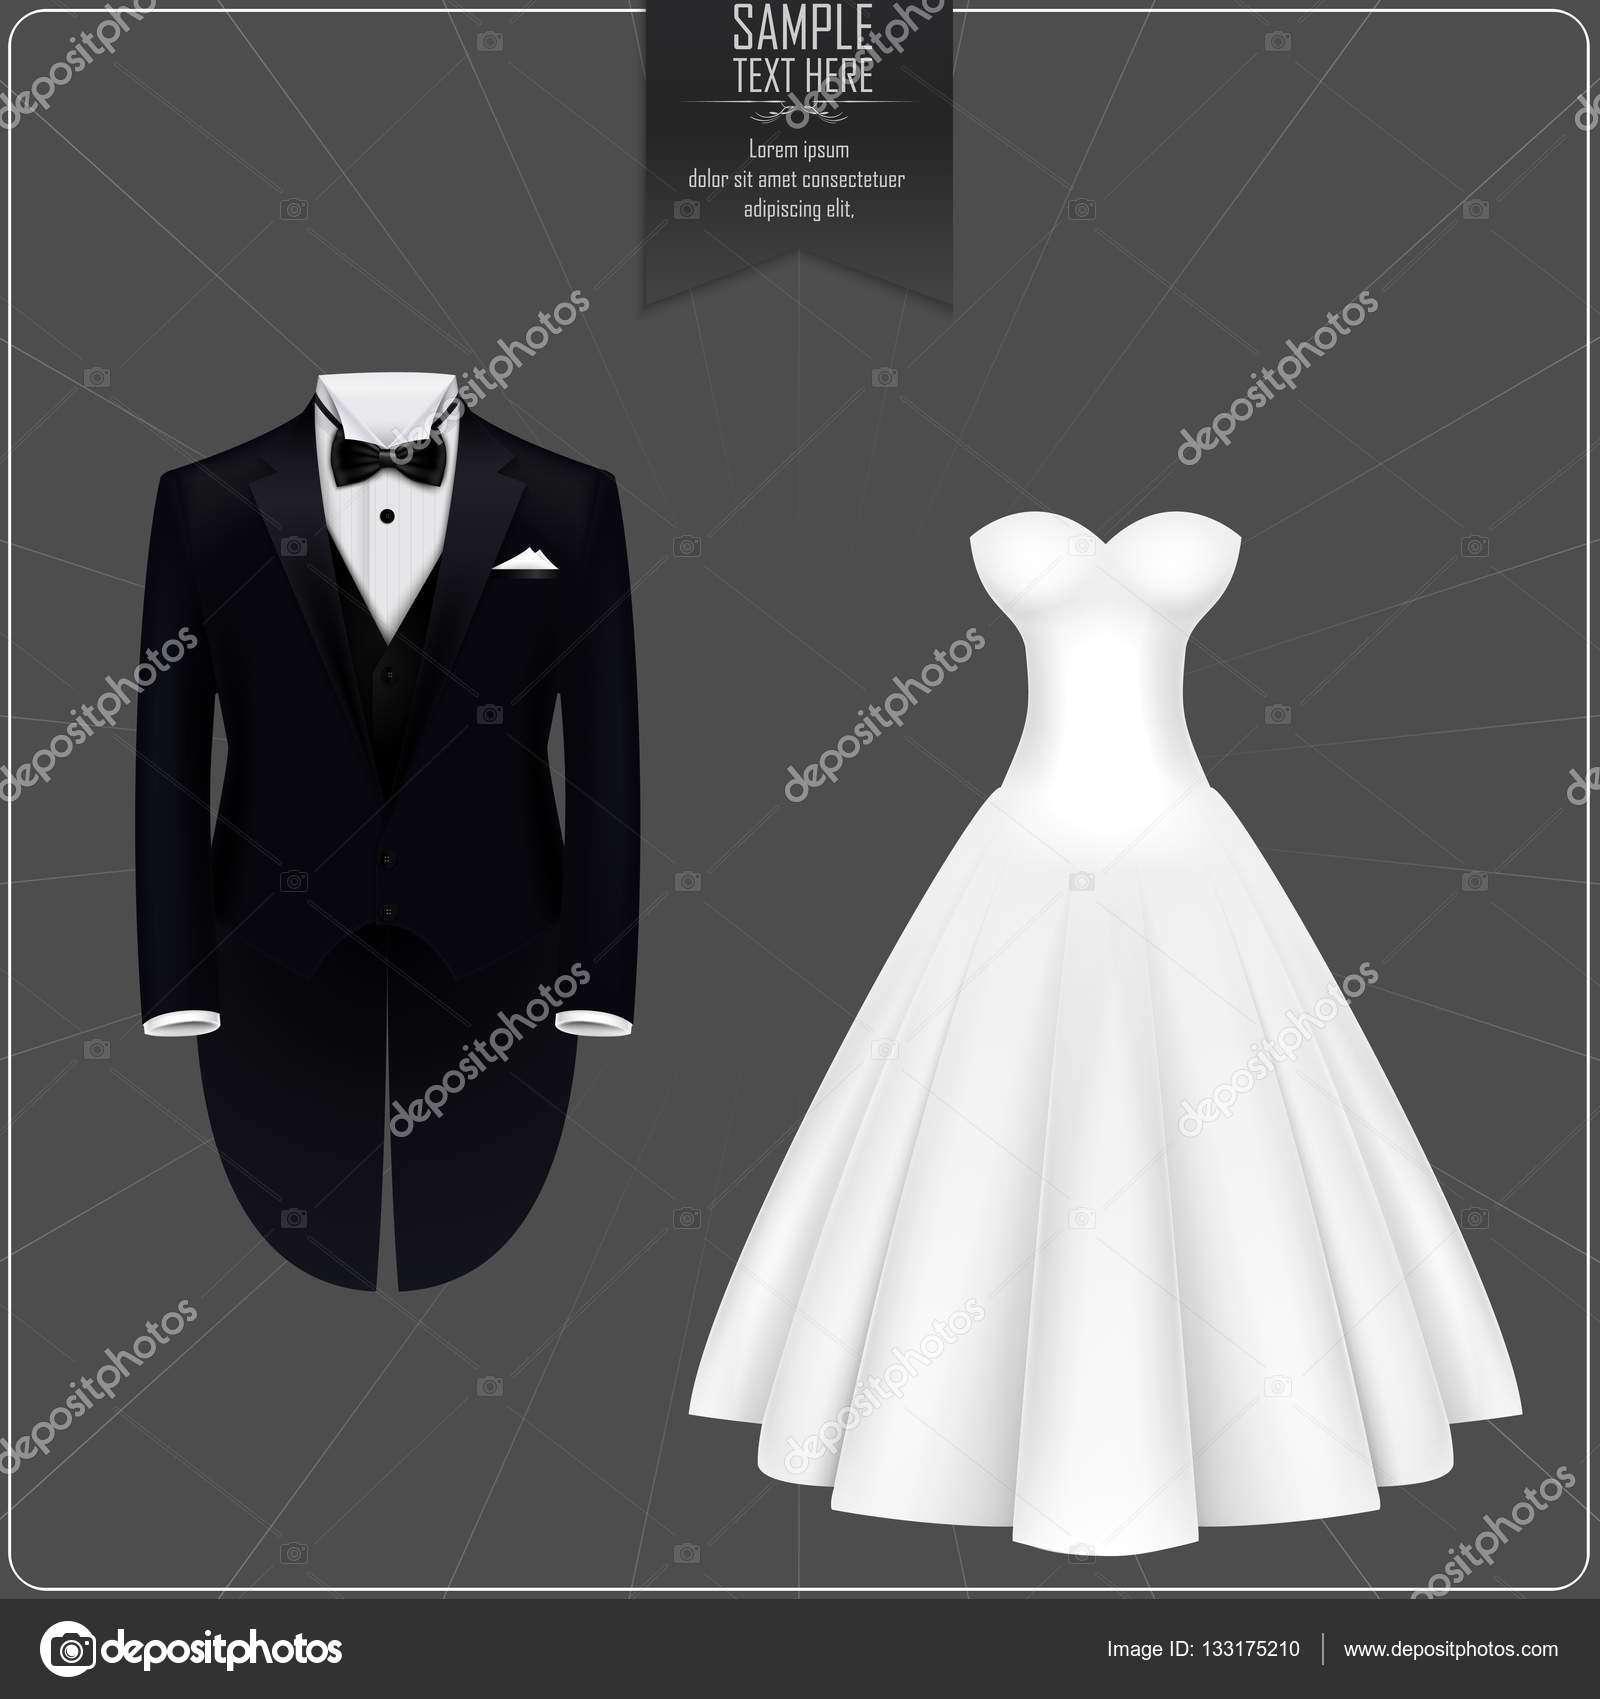 Tuxedo and bridal gown — Stock Vector © artnovi #133175210